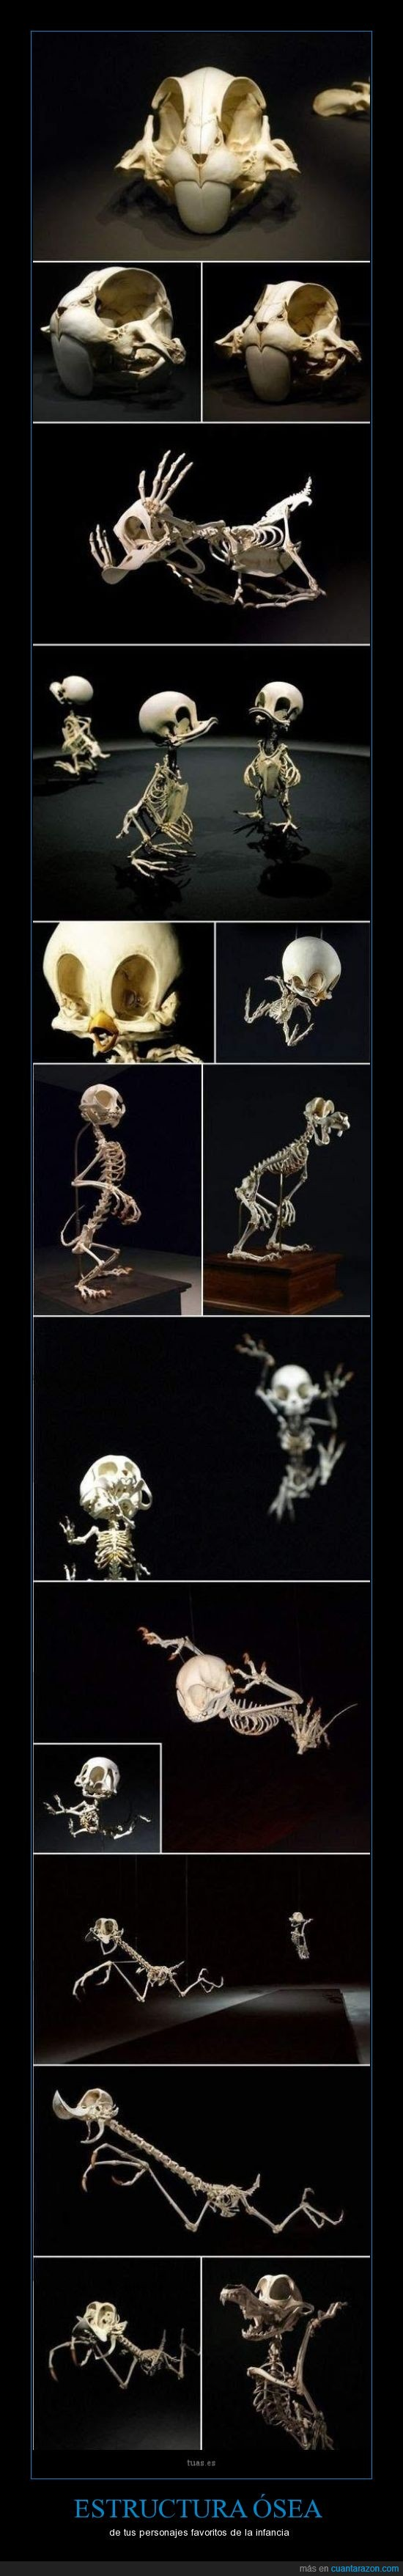 animales,correcaminos,dibujos animados,disney,esqueleto,huesos,piolín